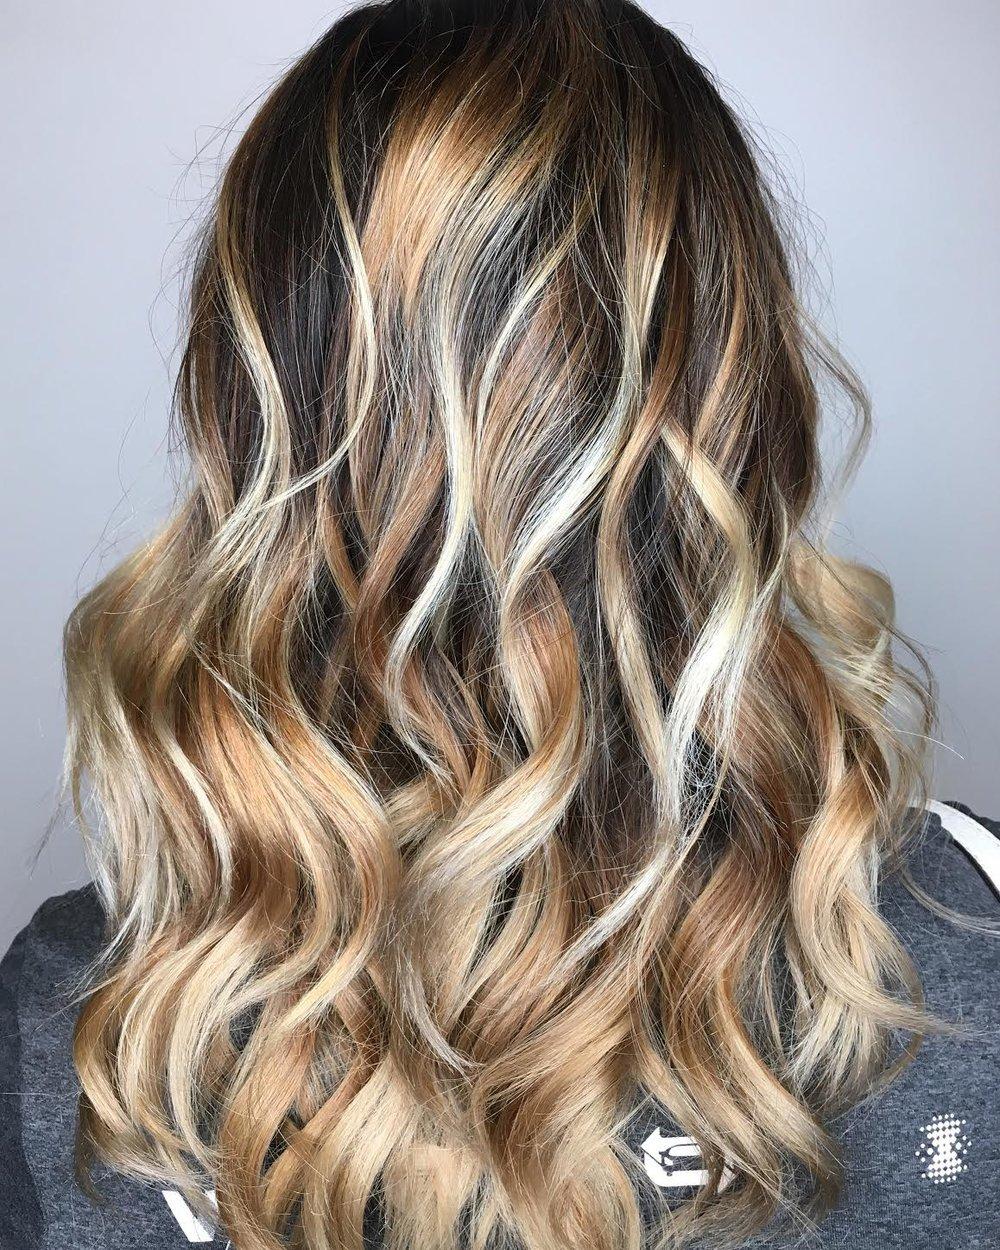 dimensional hair color balayage coppell hair salon.jpg